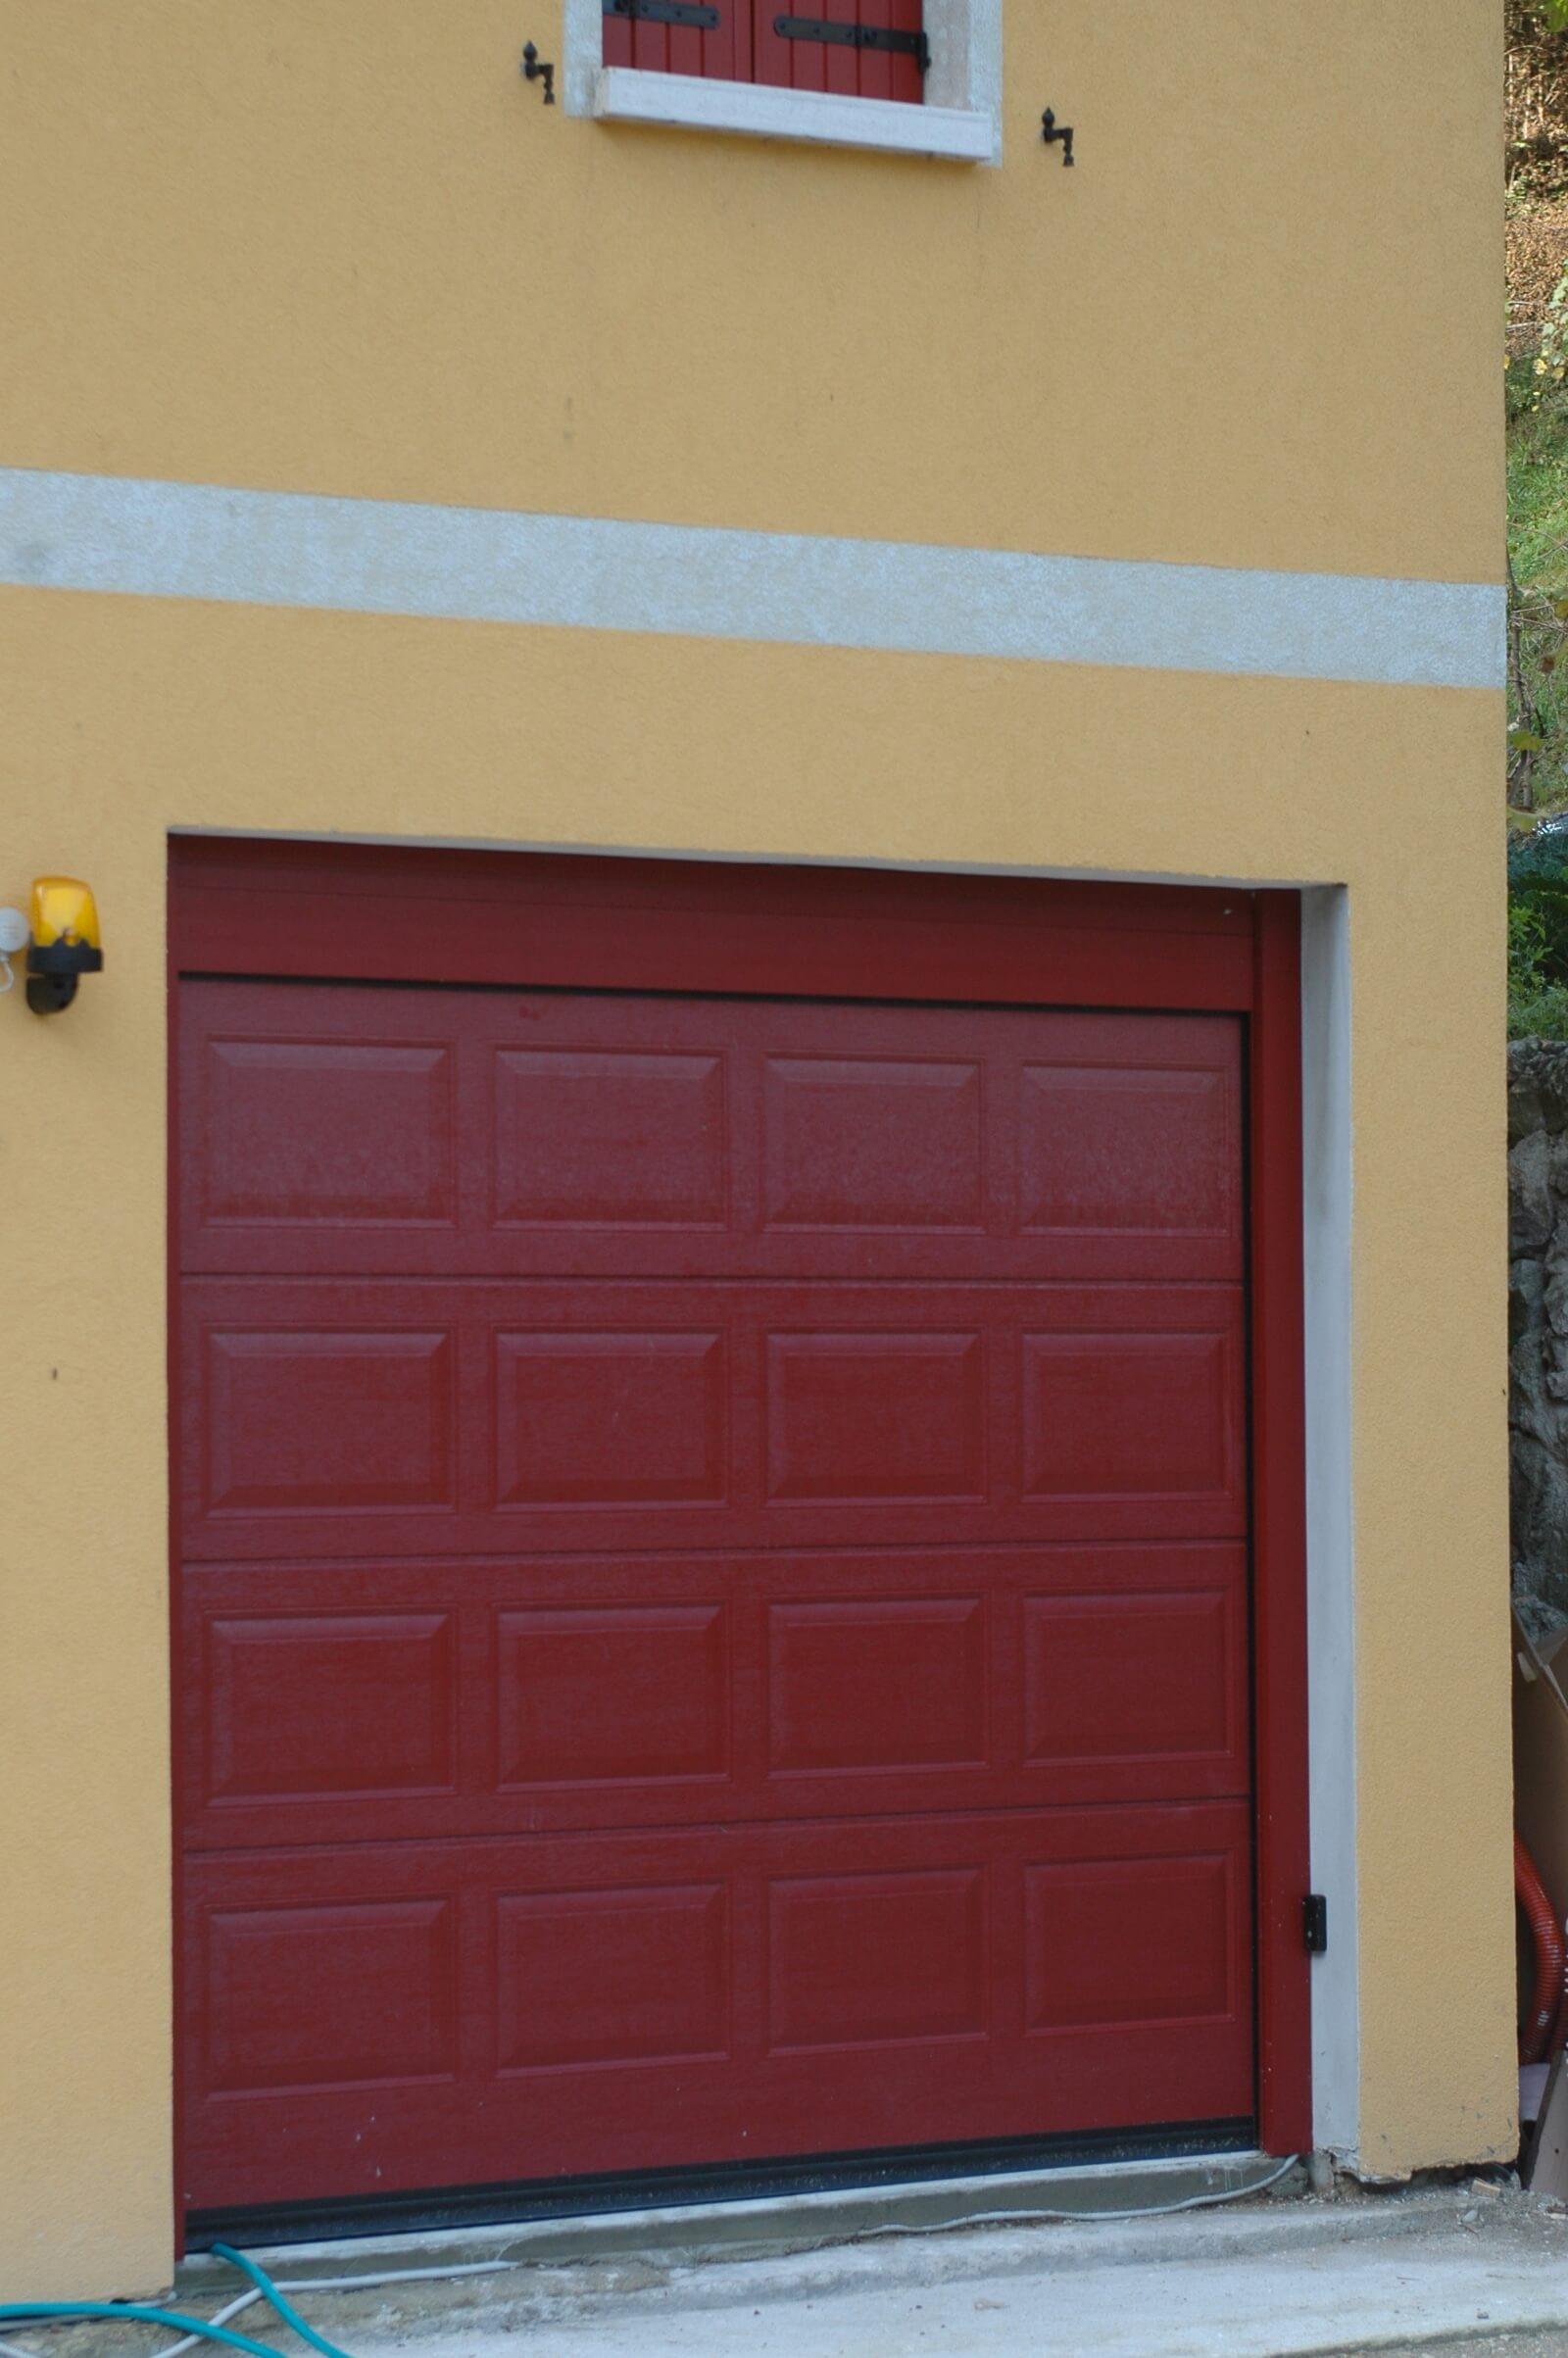 Portone sezionale per garage ANS RL42